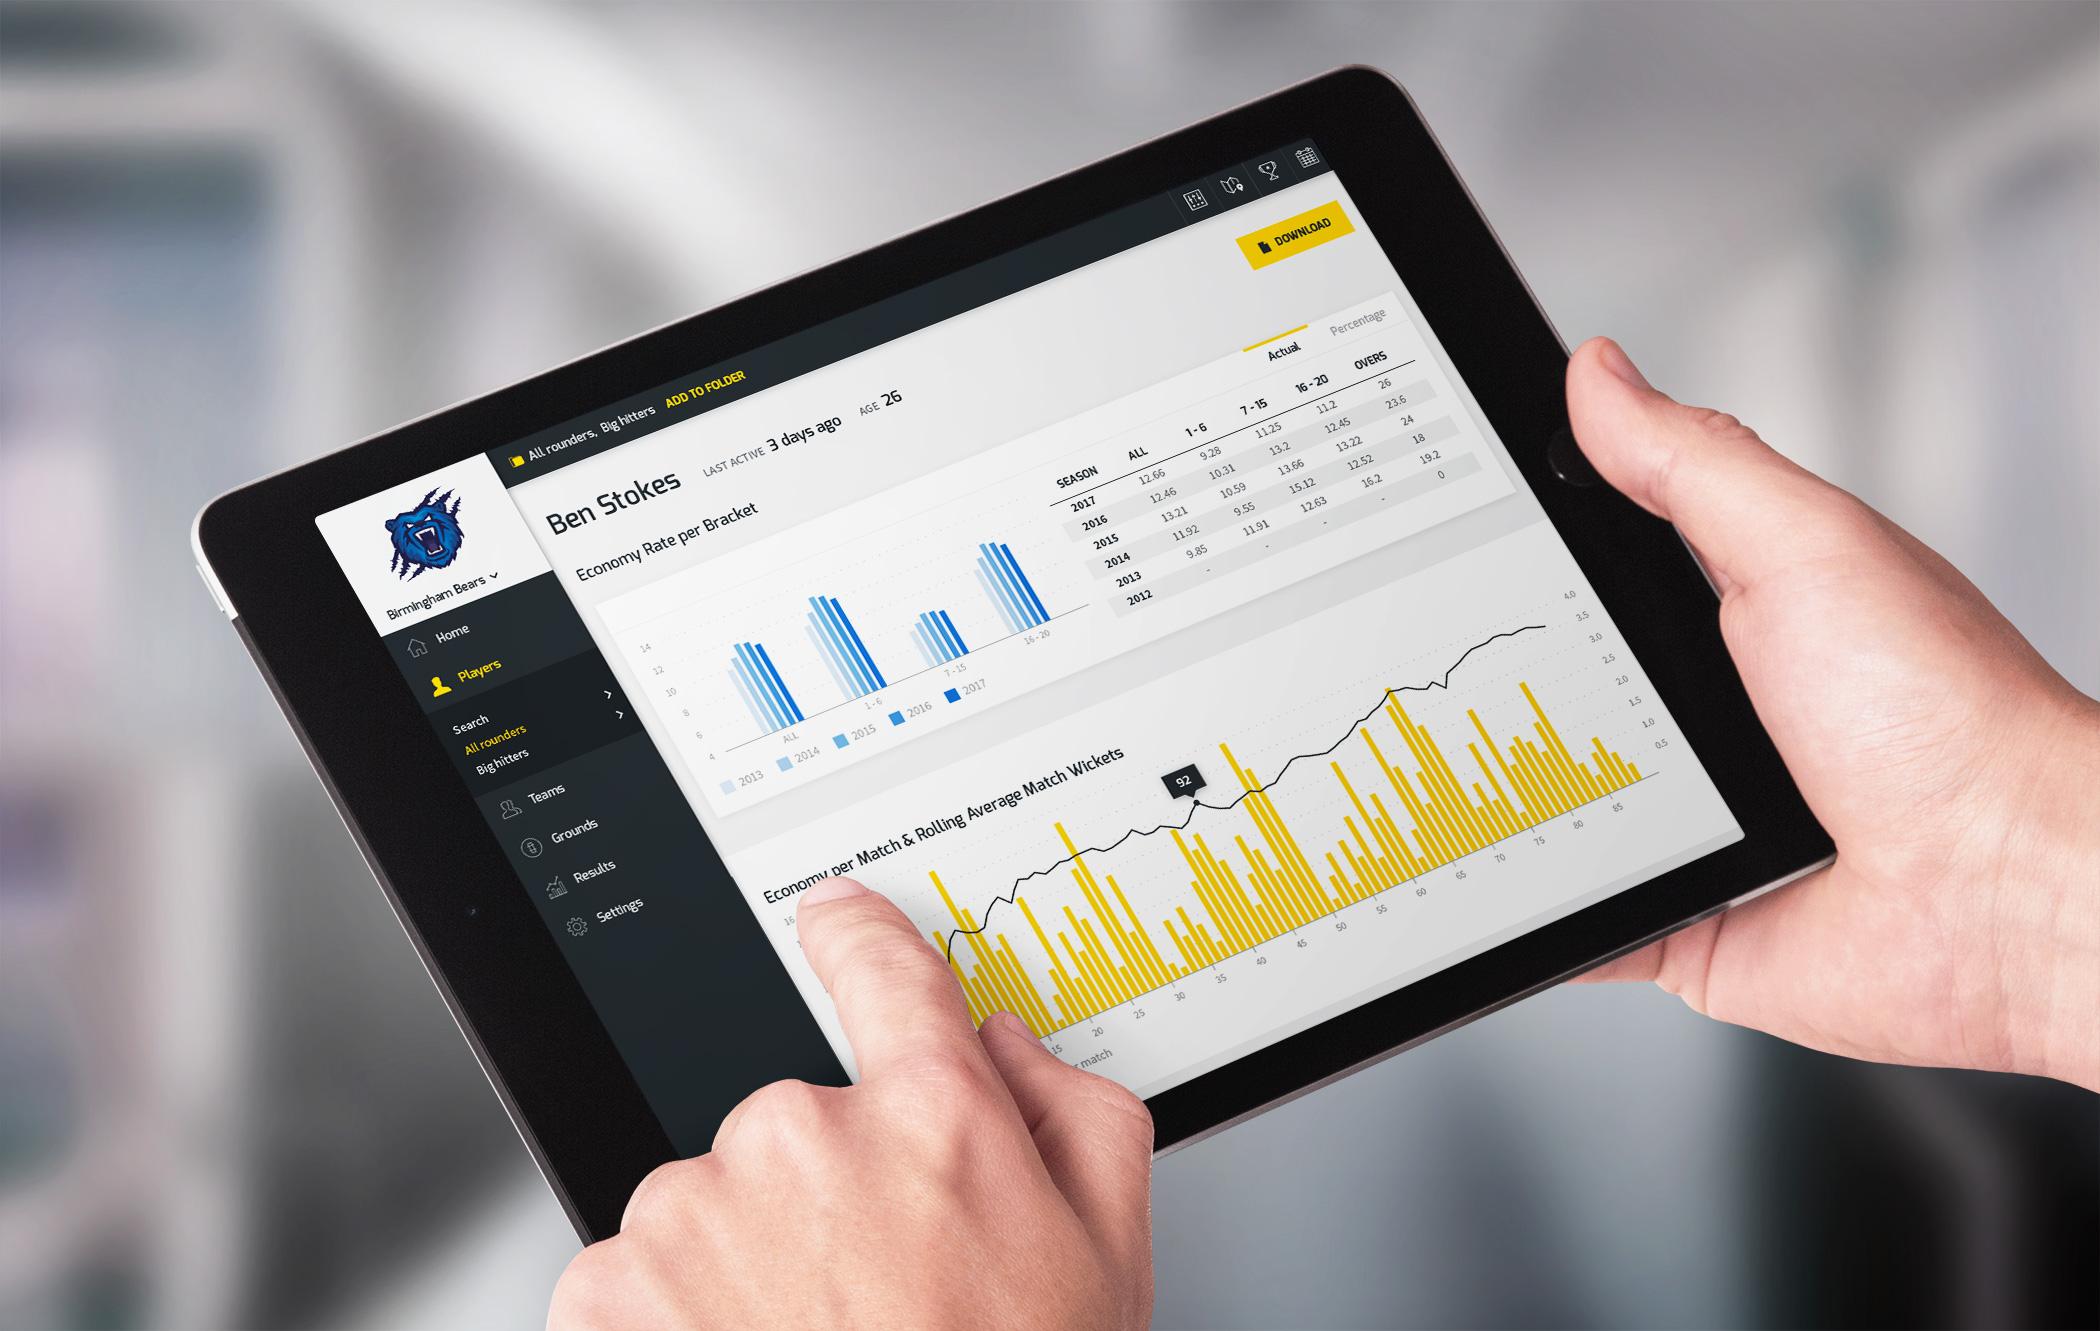 Cricket PIR user interface design on tablet